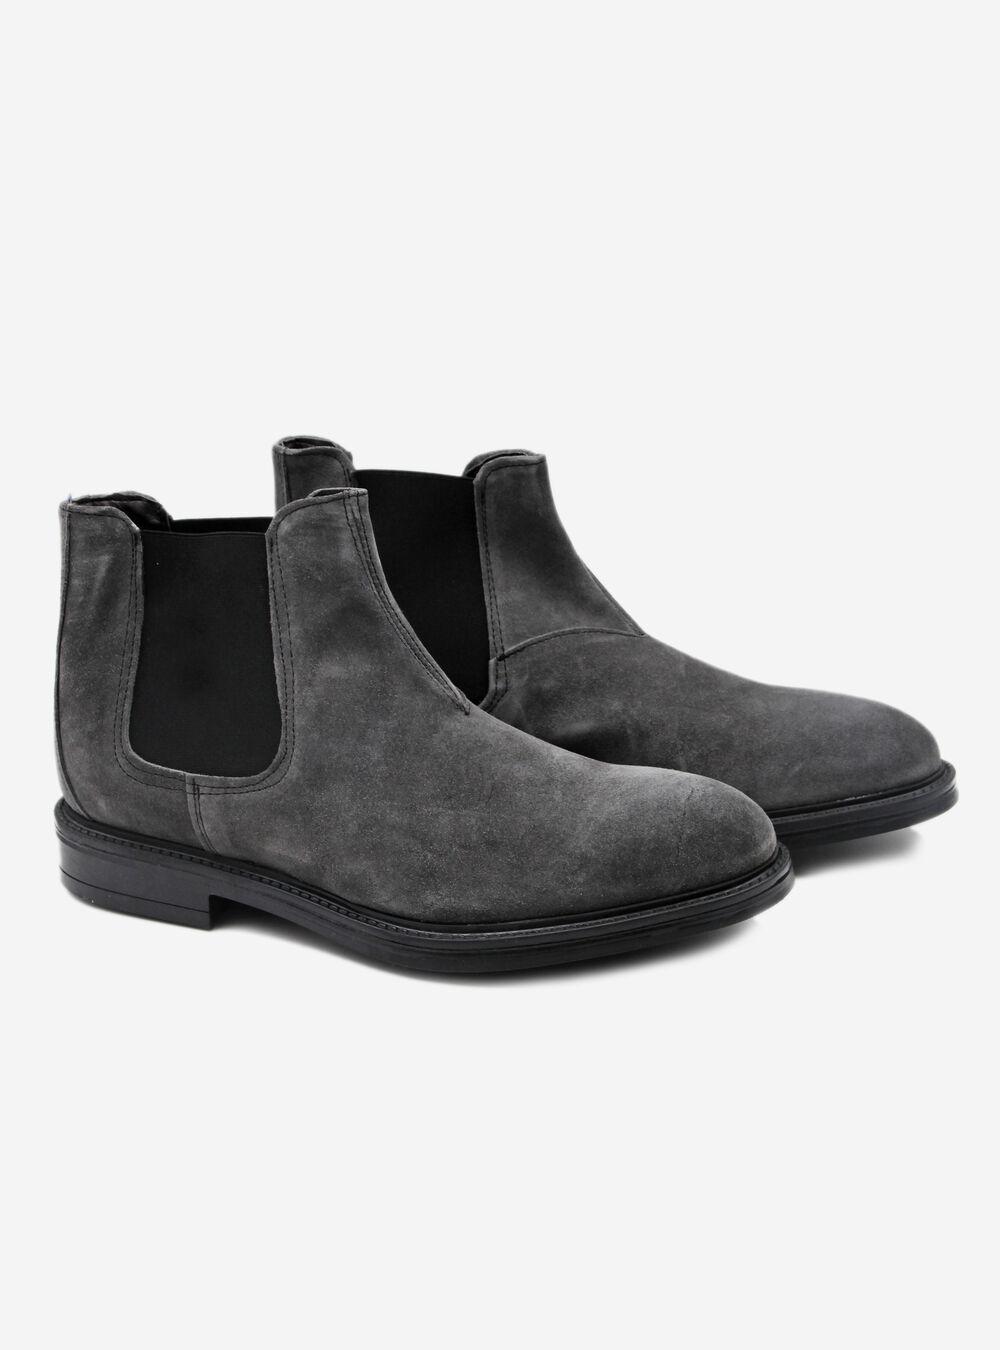 hot sale online 16054 54df1 Scarpe Uomo: scarpe basse e sneakers   Alcott